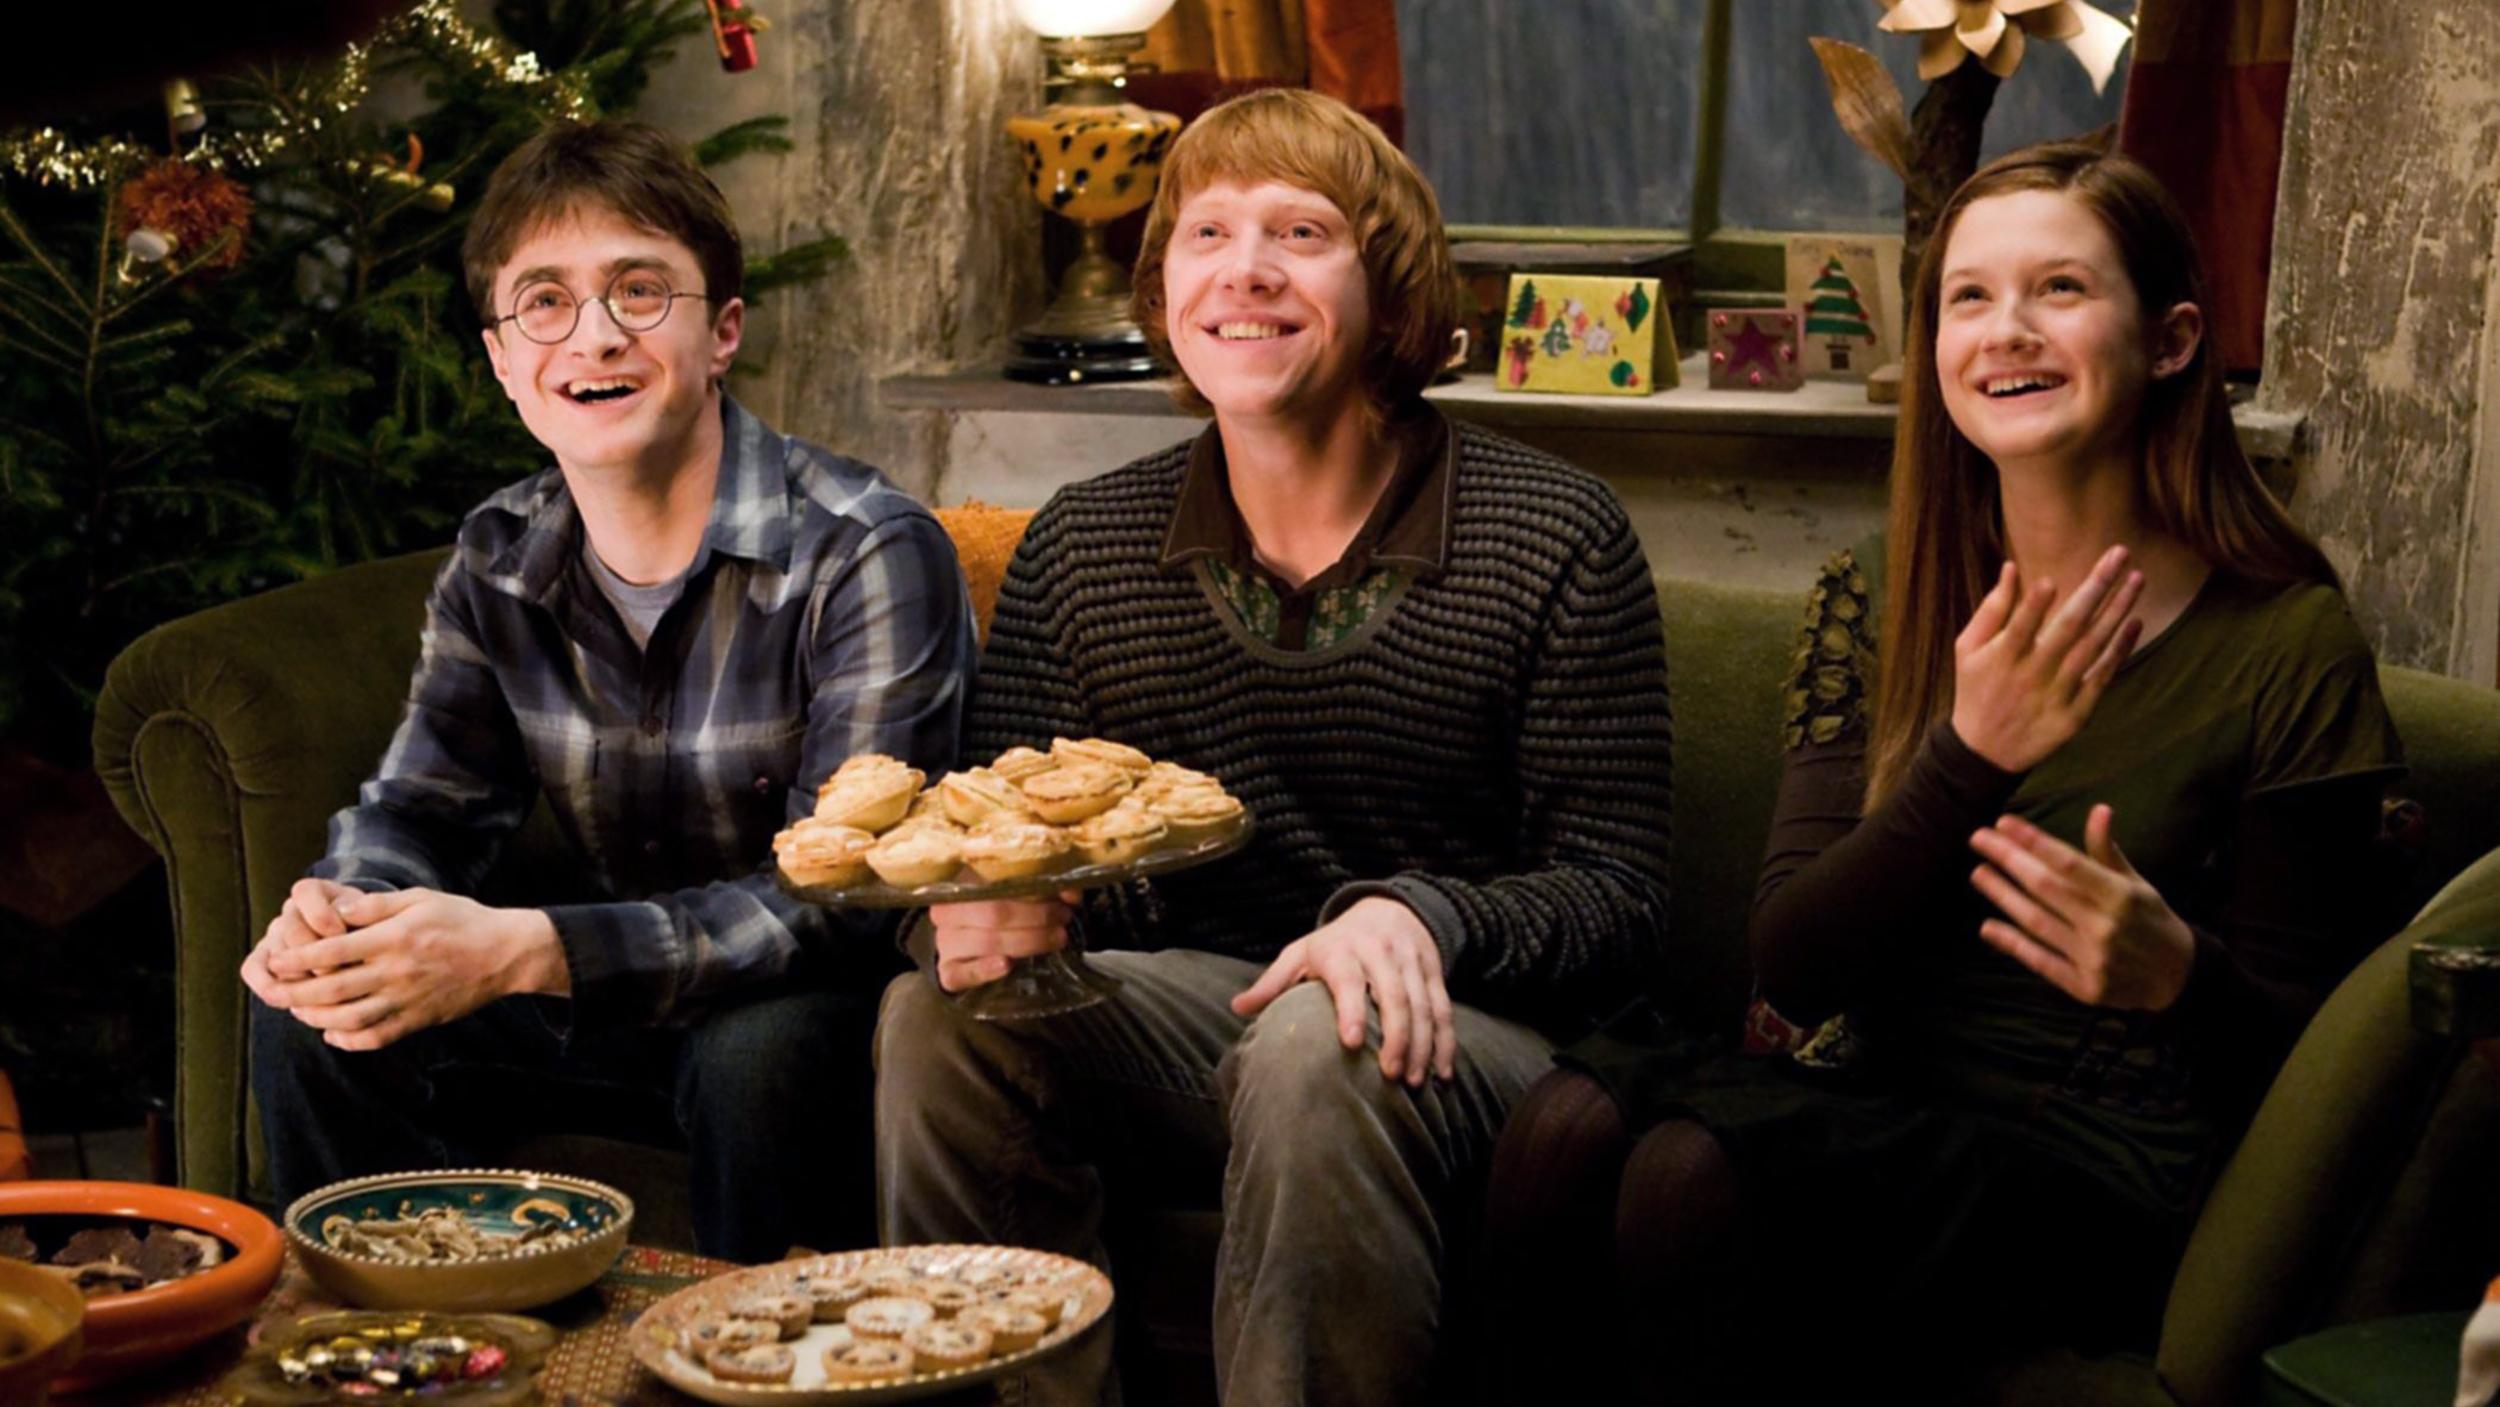 'Harry Potter' fans, get ready for feels! This Weasley ...  'Harry Pott...